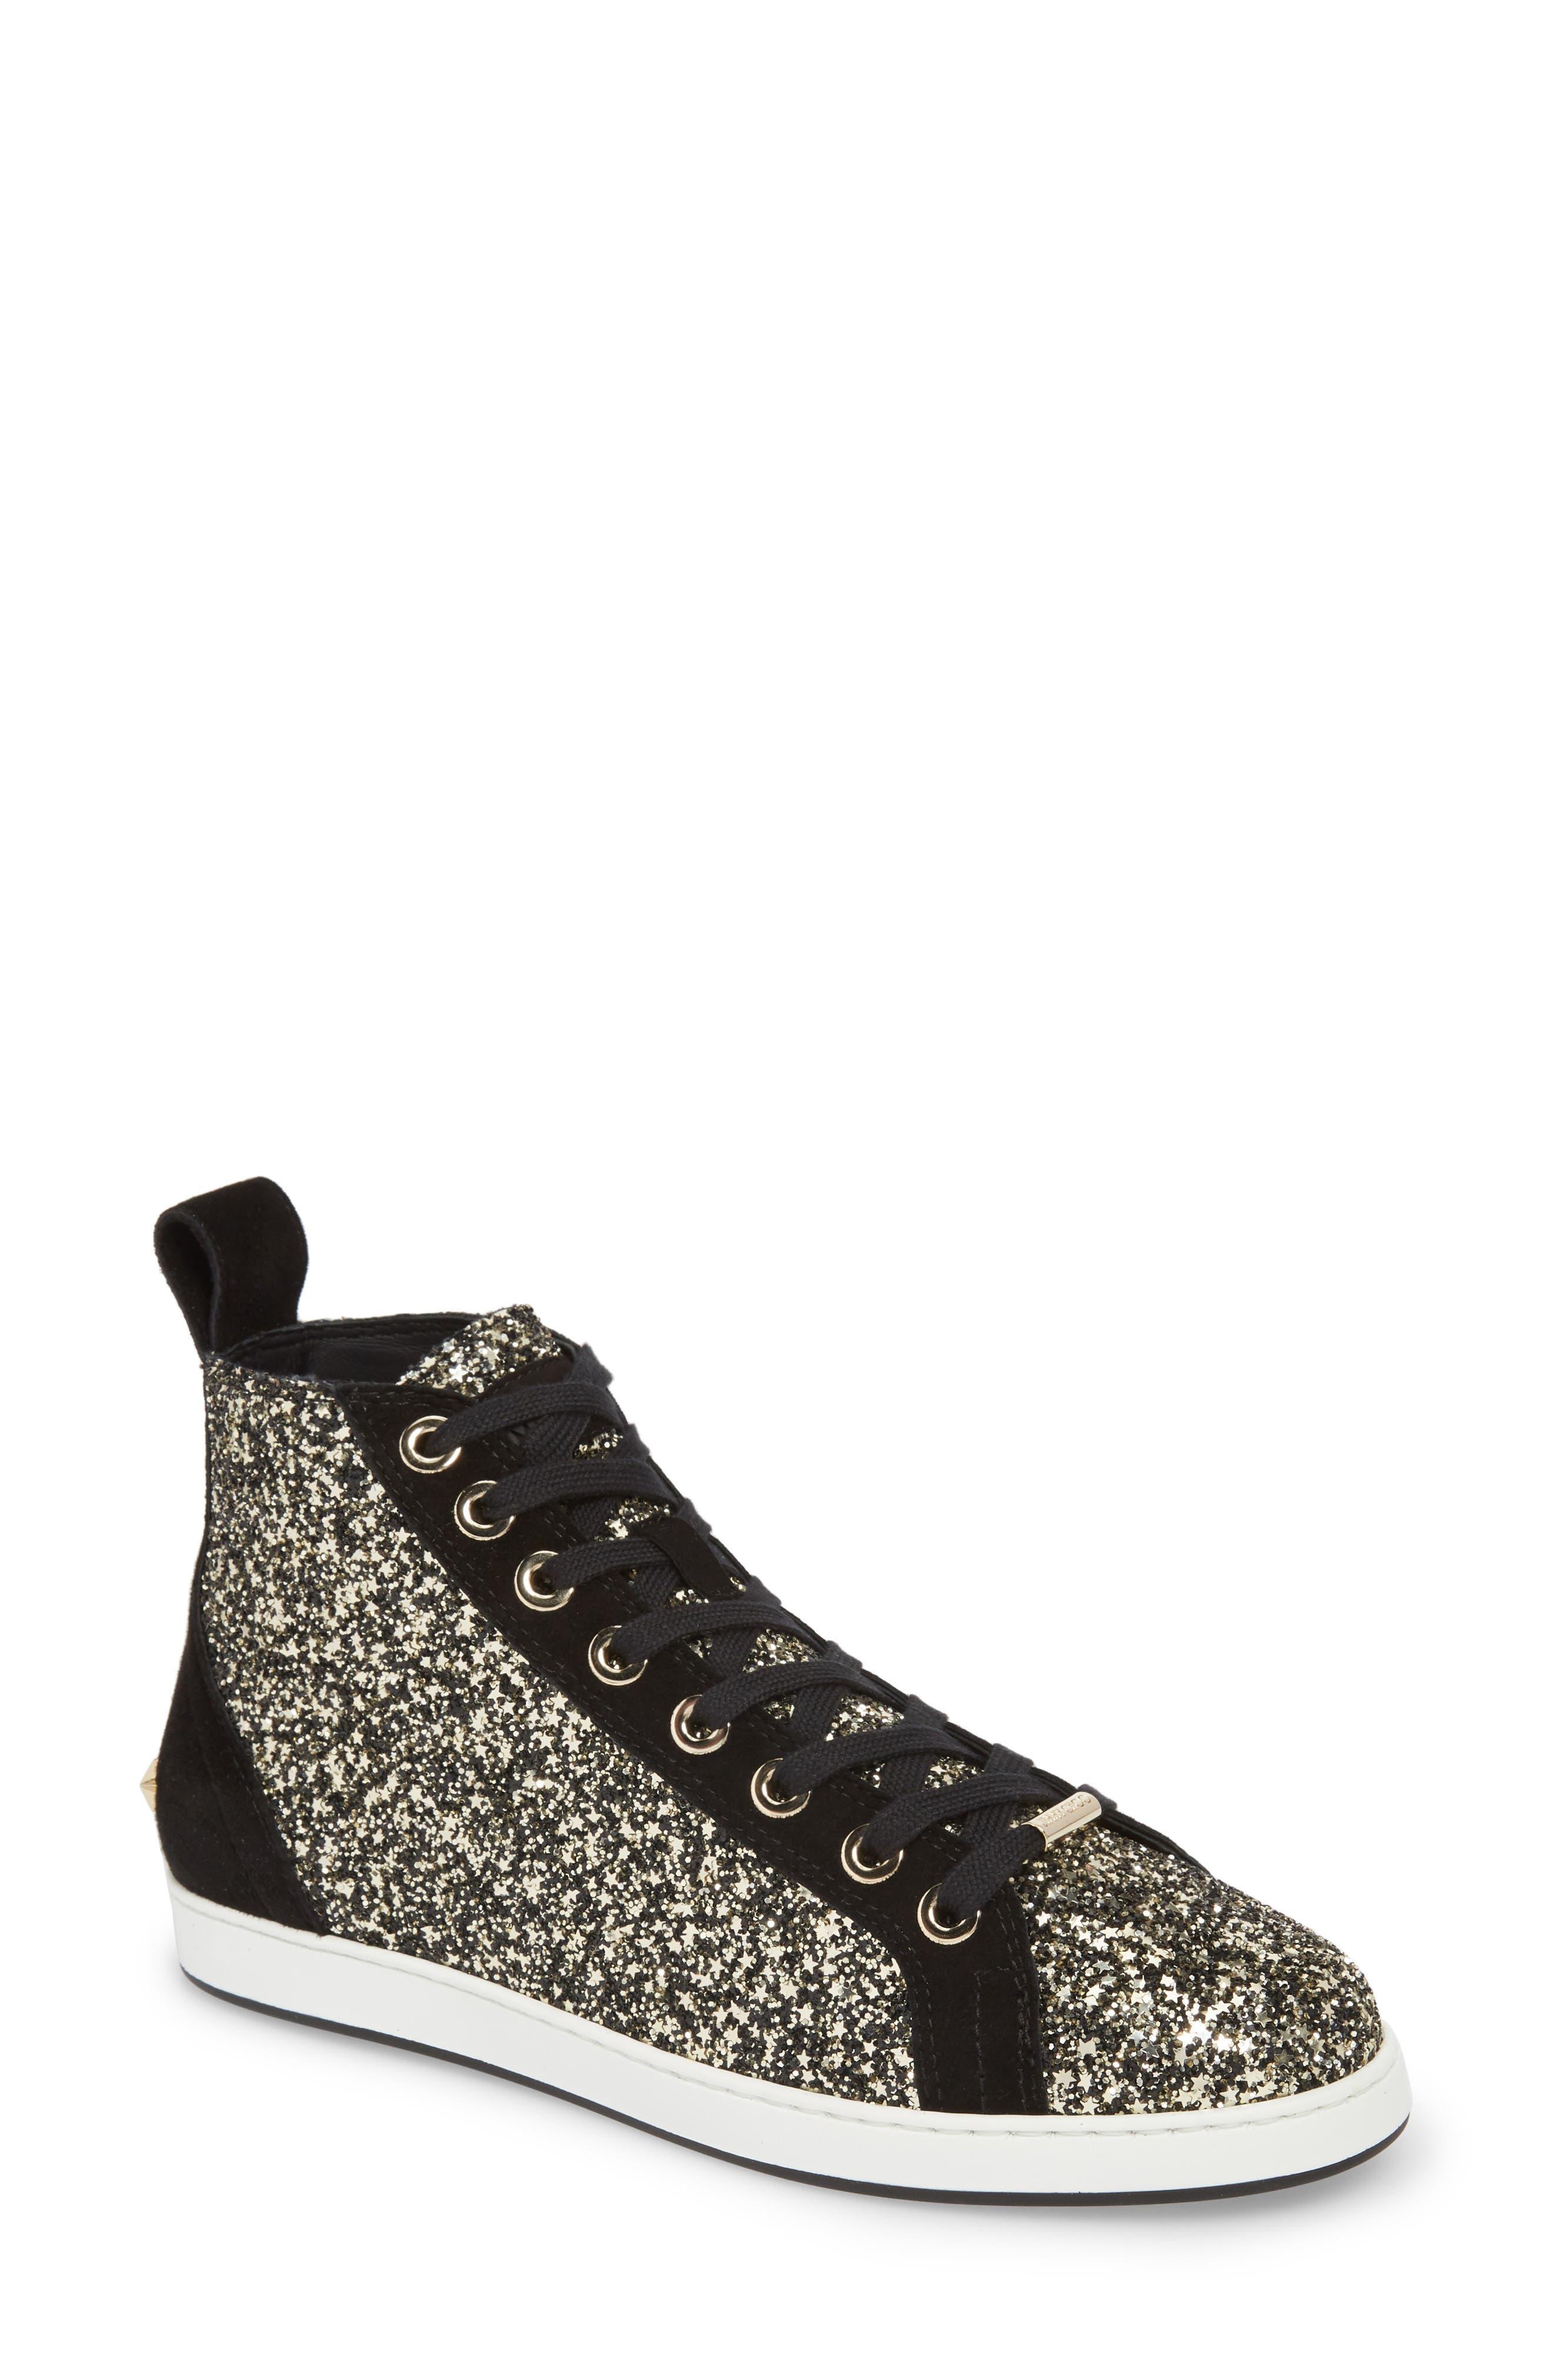 Colt Glitter High Top Sneaker,                             Main thumbnail 1, color,                             710